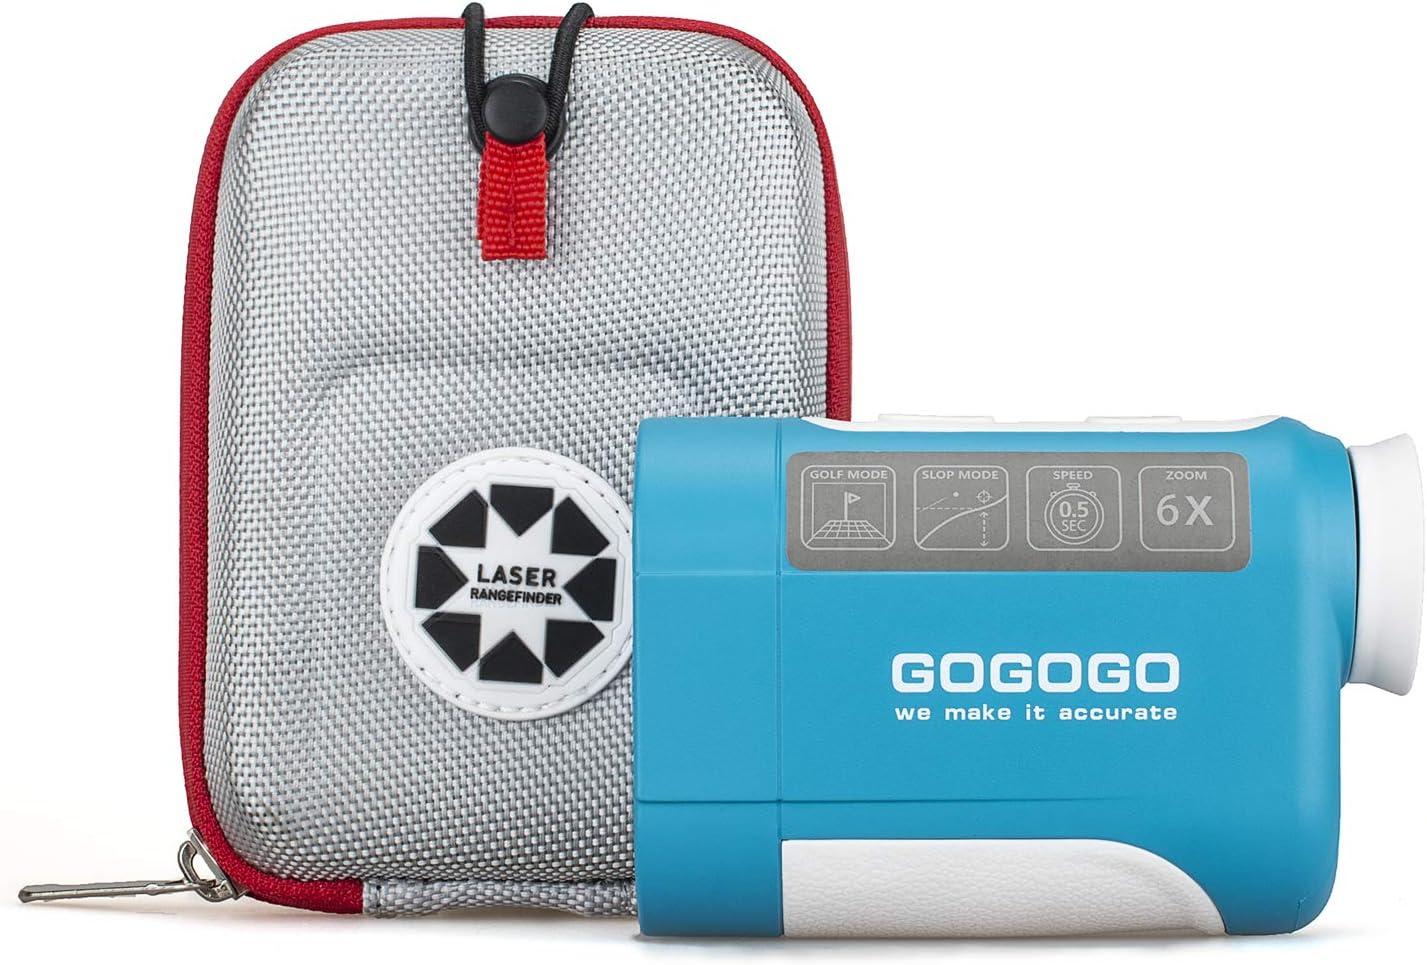 Gogogo Sport 650/900Yard Golf Rangefinder, 6X Magnification Laser Range Finder, with Pinsensor - Flag-Lock - Support Vibration - Slope Calculation- High-Precision Scan - Include Battery CR2